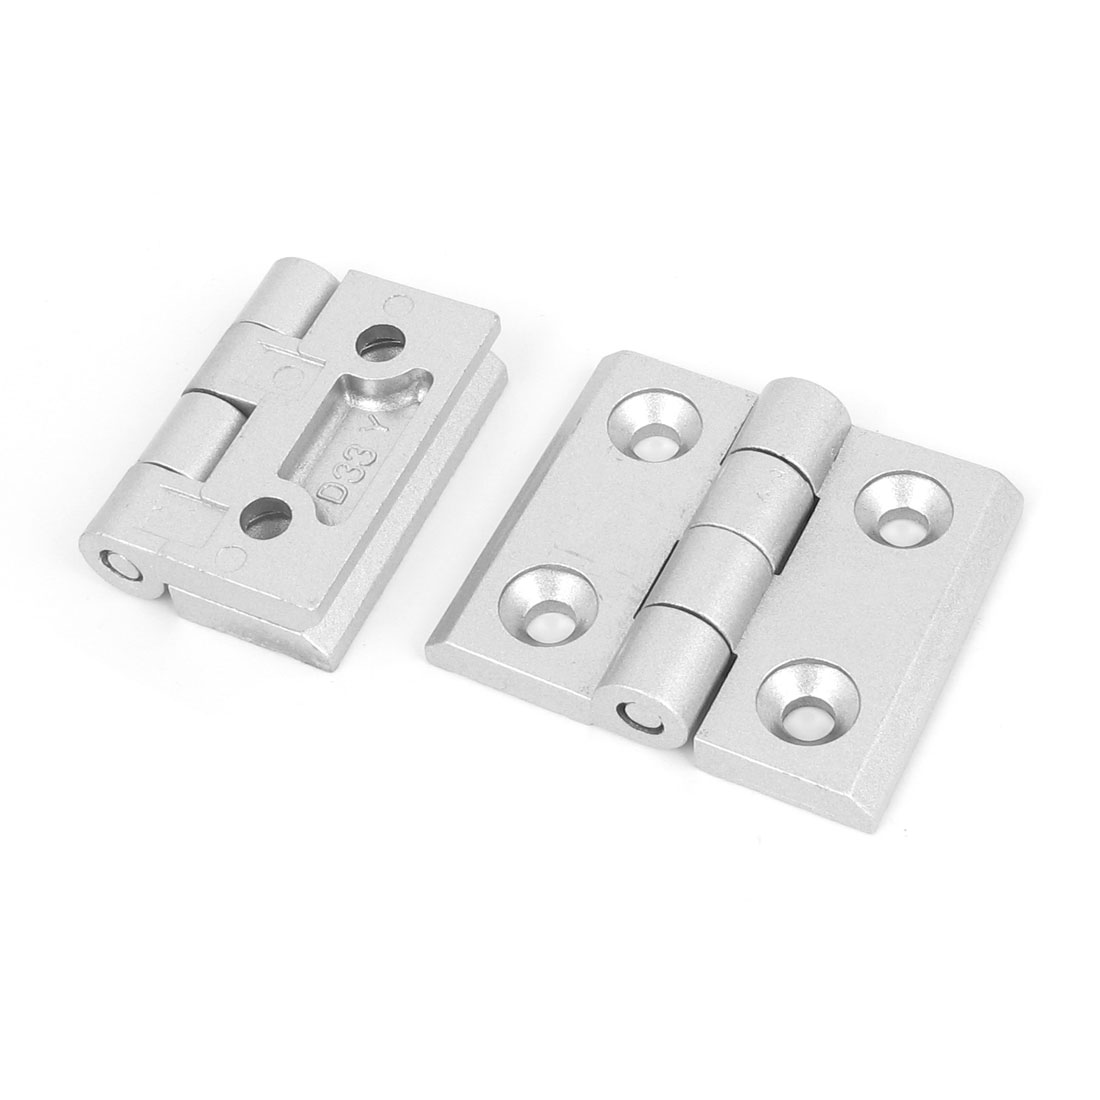 Cupboard Cabinet Closet Aluminum Alloy Foldable Door Butt Hinge 2pcs